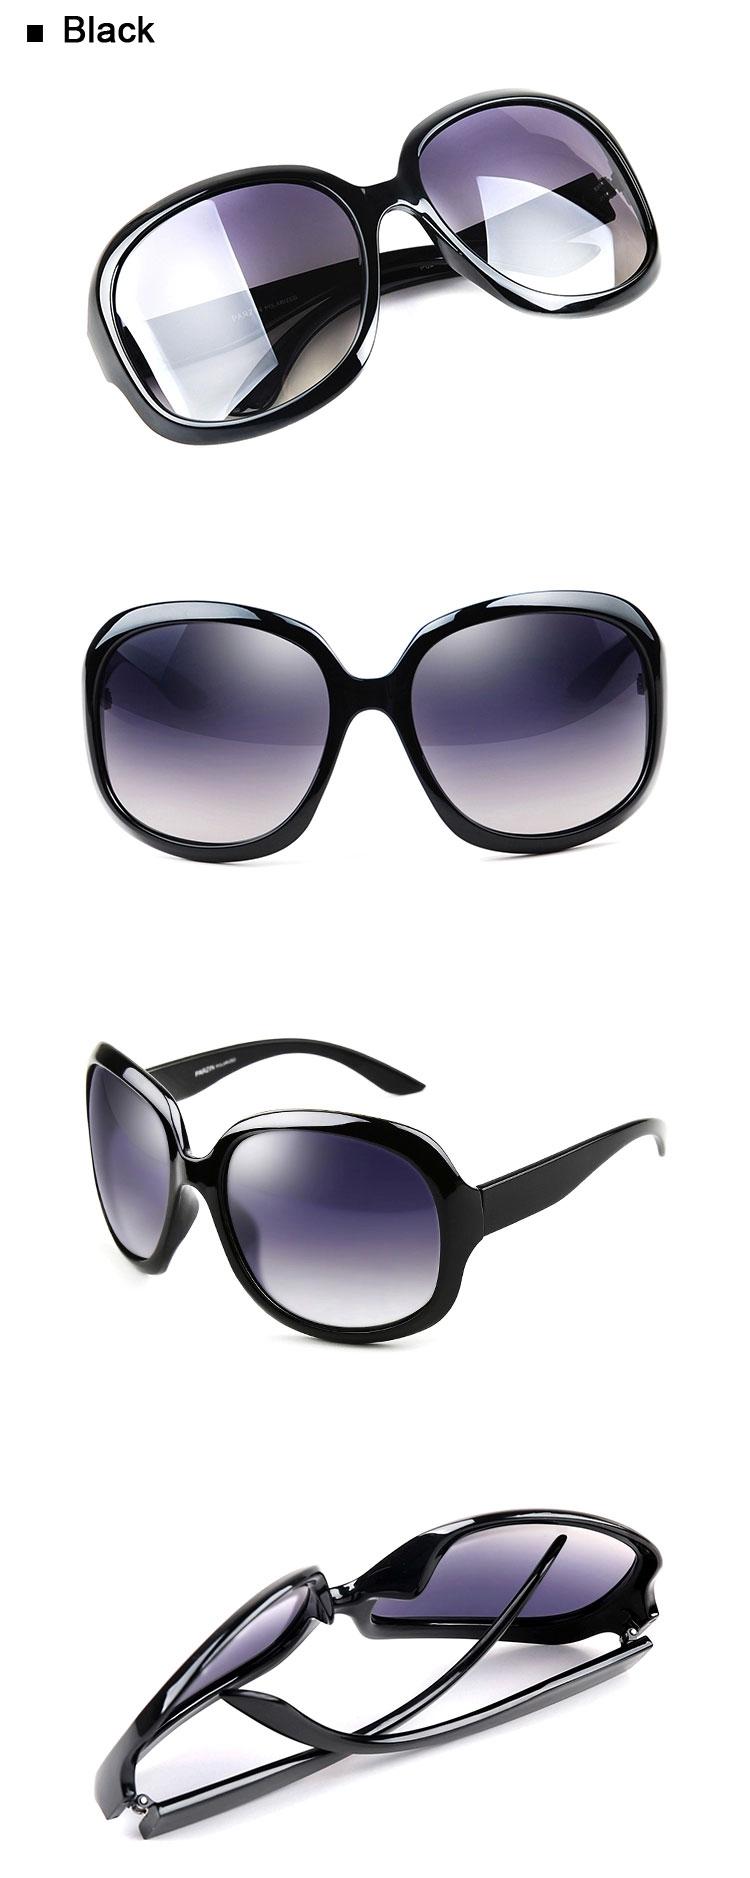 Black Retro Oversized Sunglasses